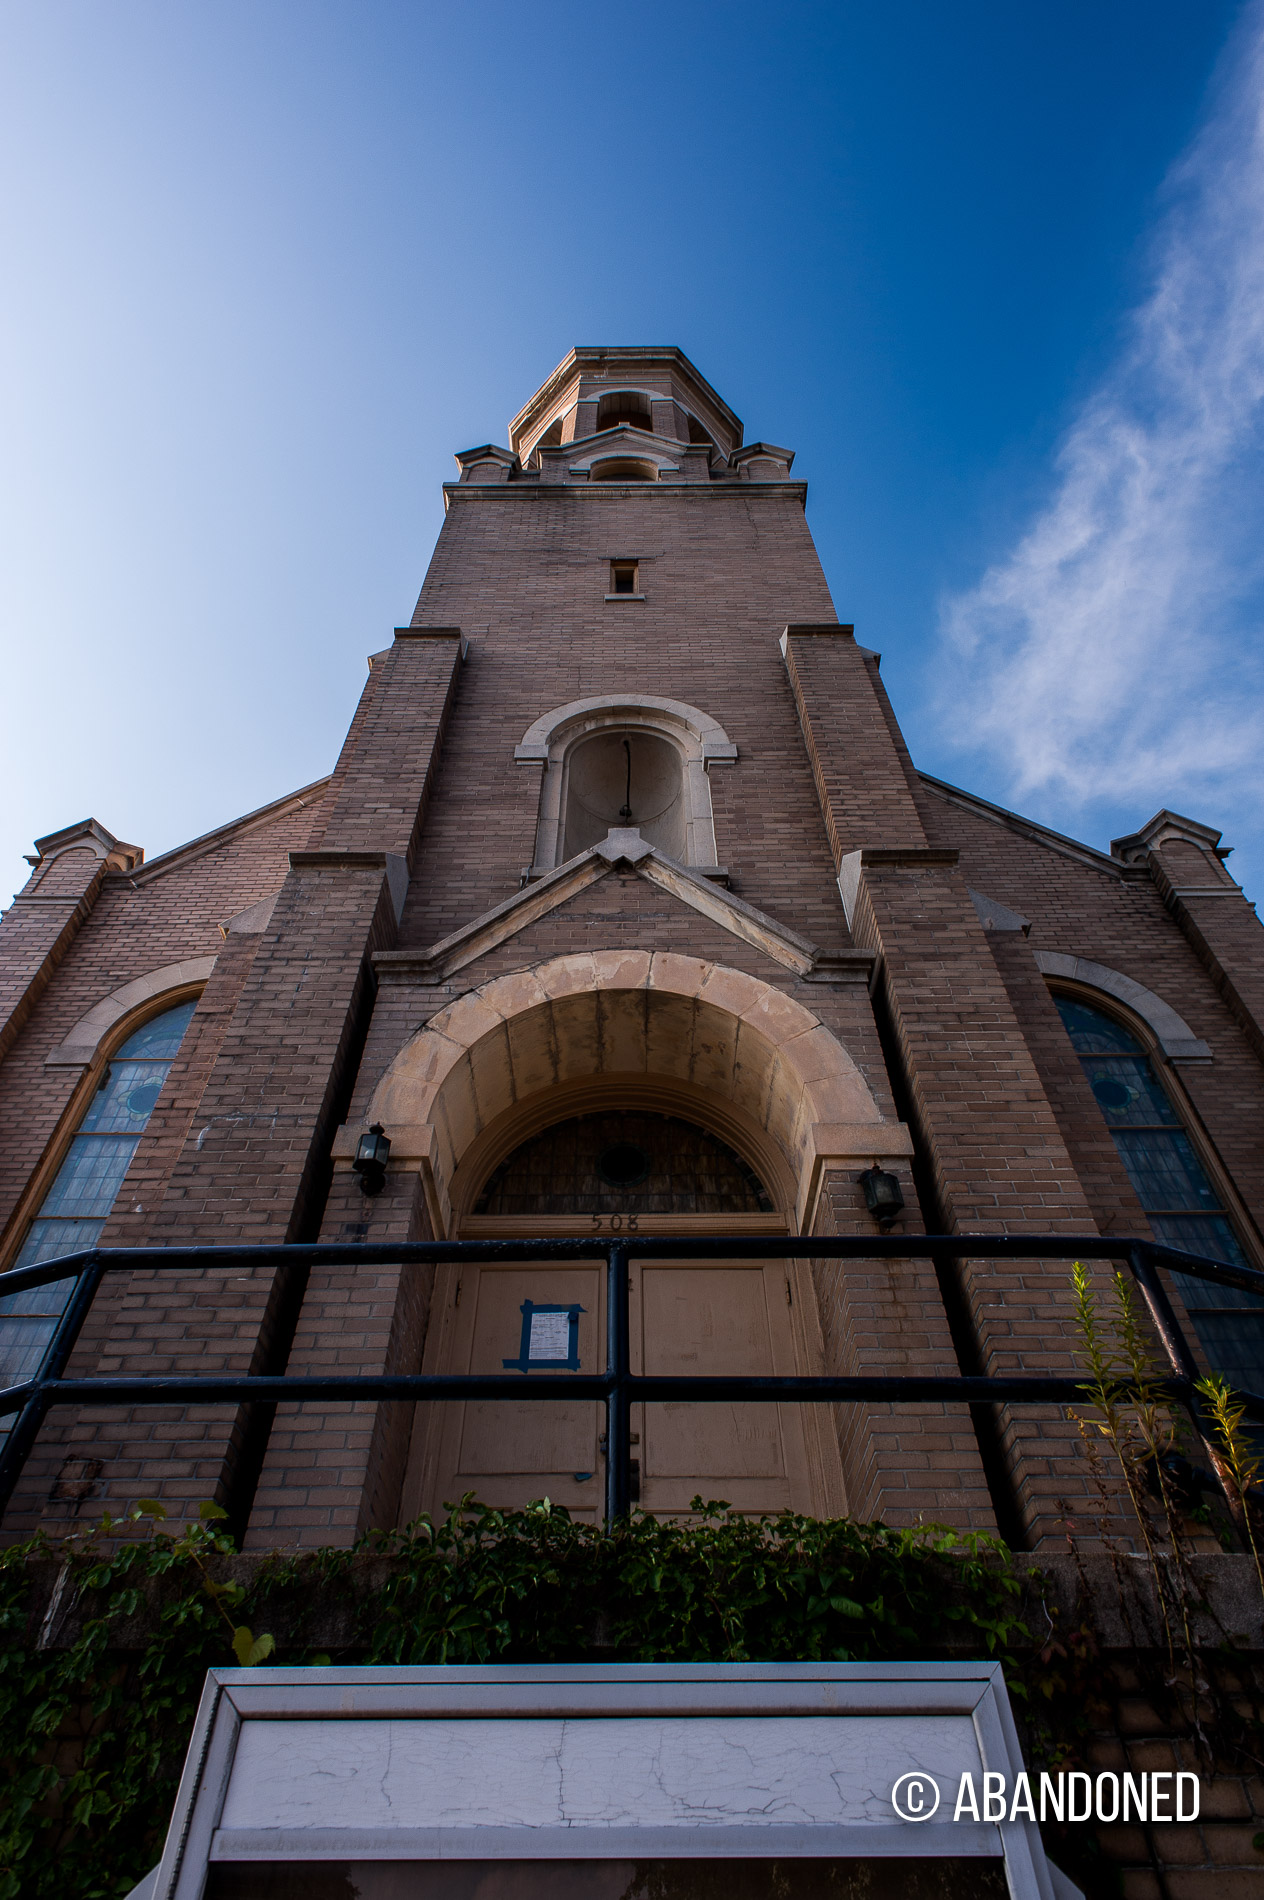 Holy Rosary Catholic Church - Abandoned by Sherman Cahal